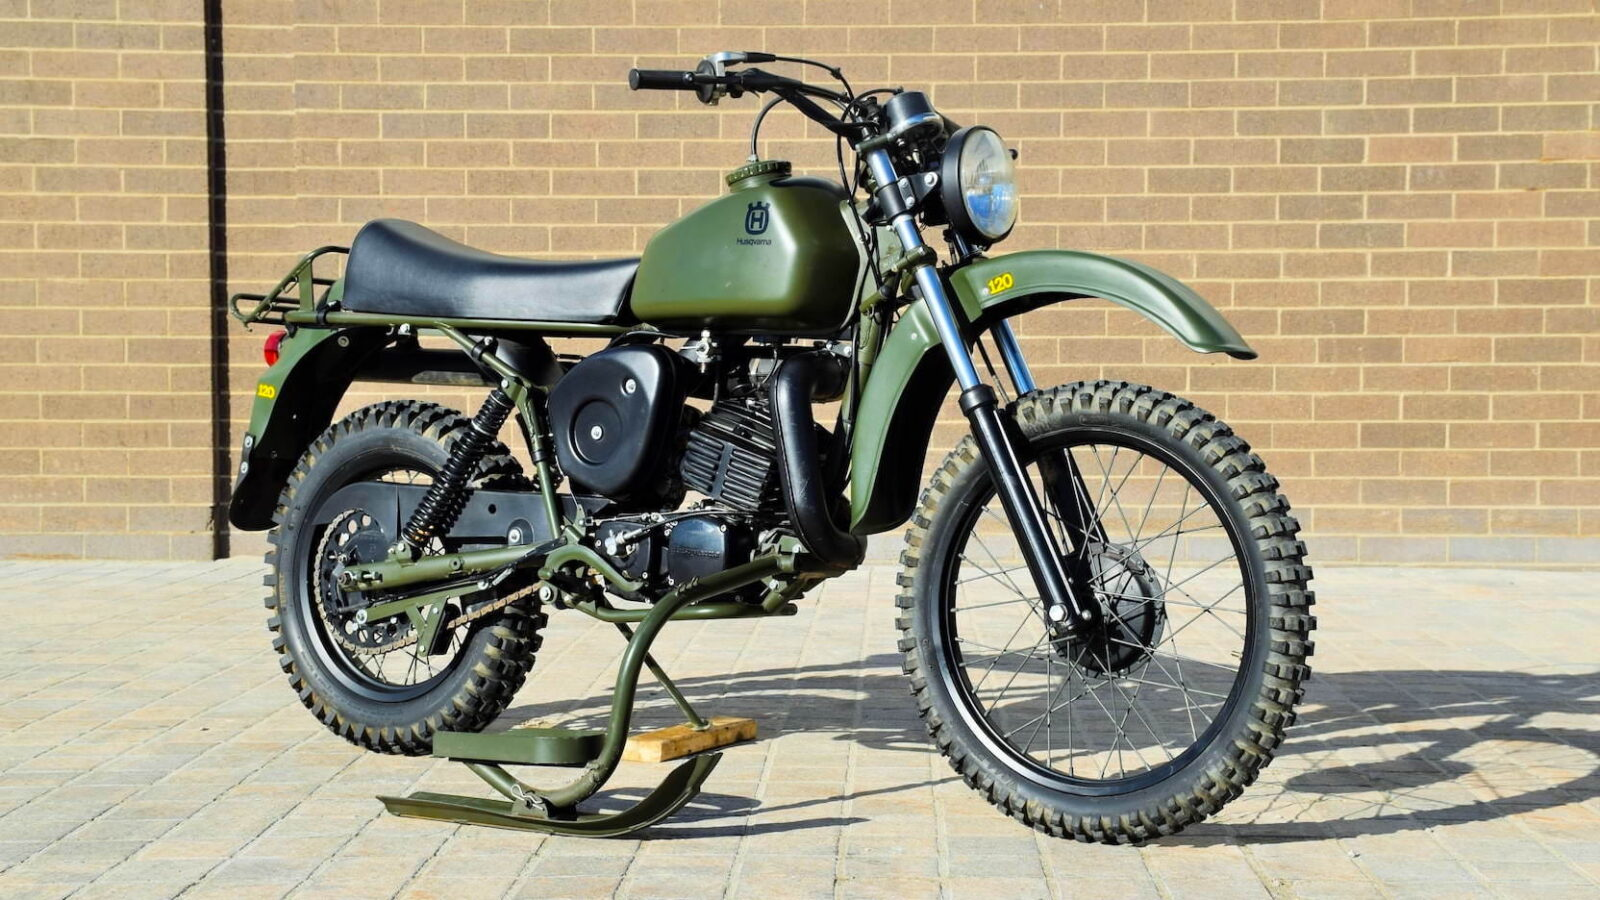 Husqvarna Model 258 Military Motorcycle 3